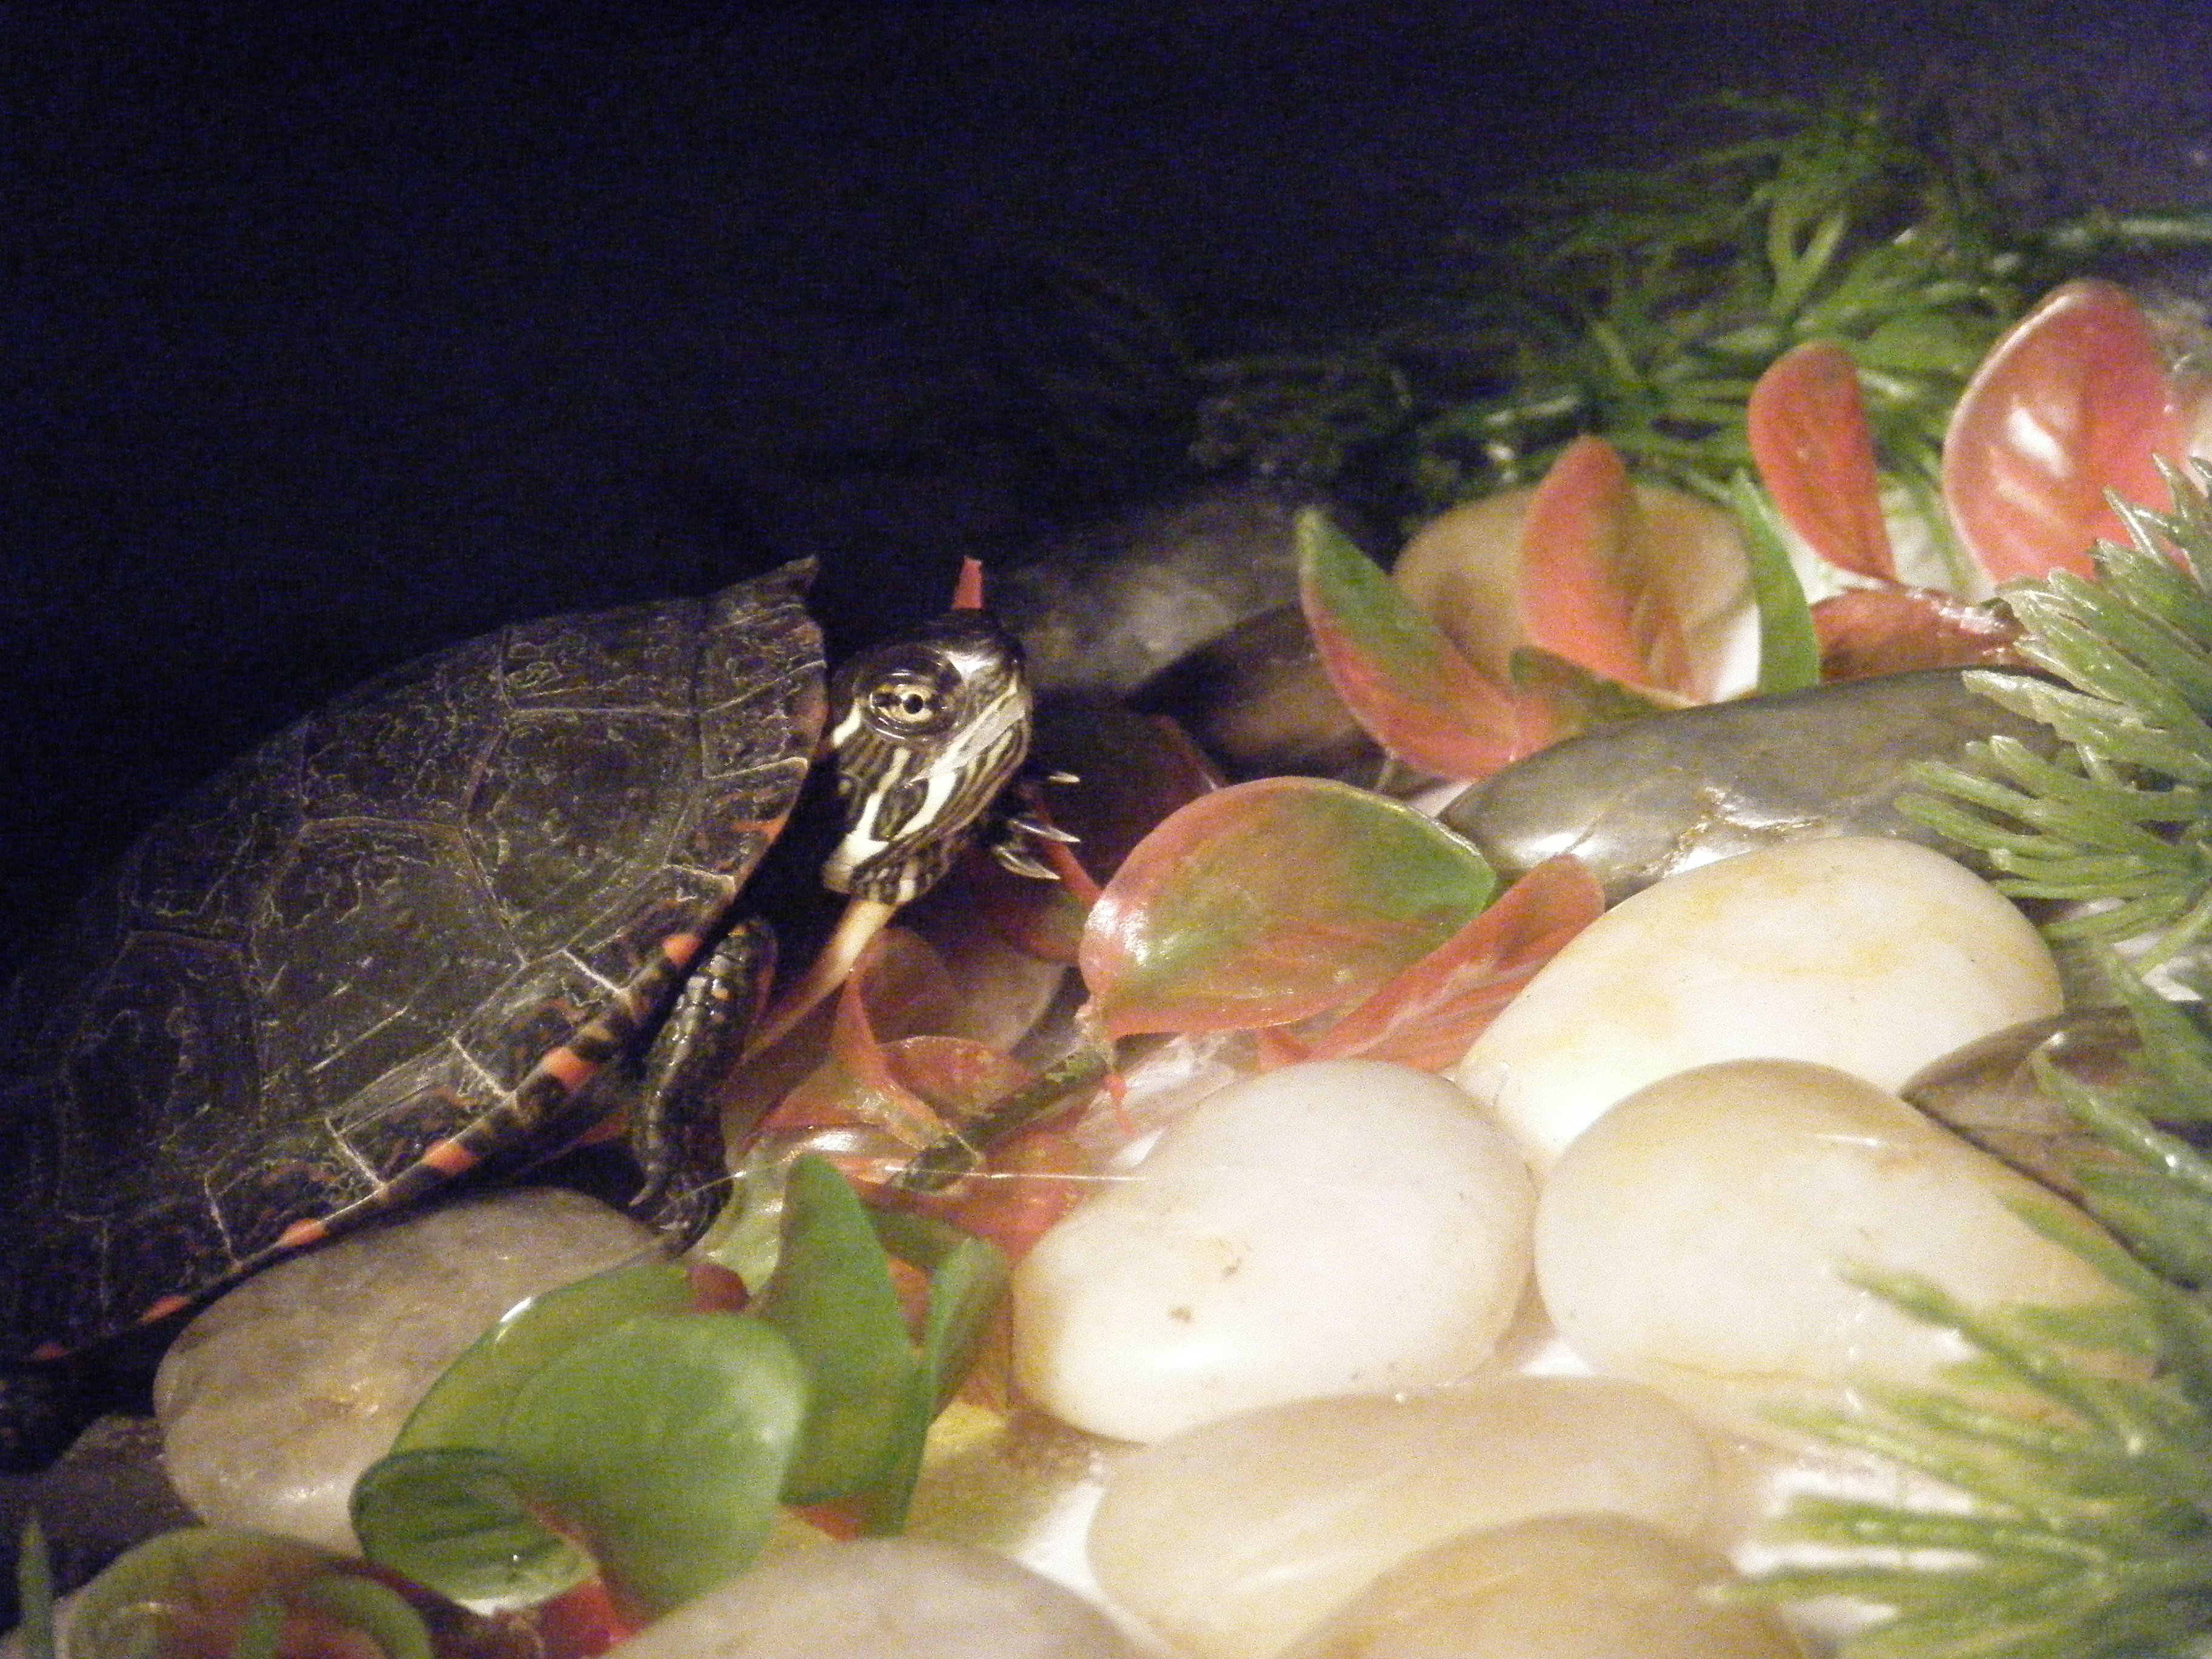 Styrofoam turtle Dock